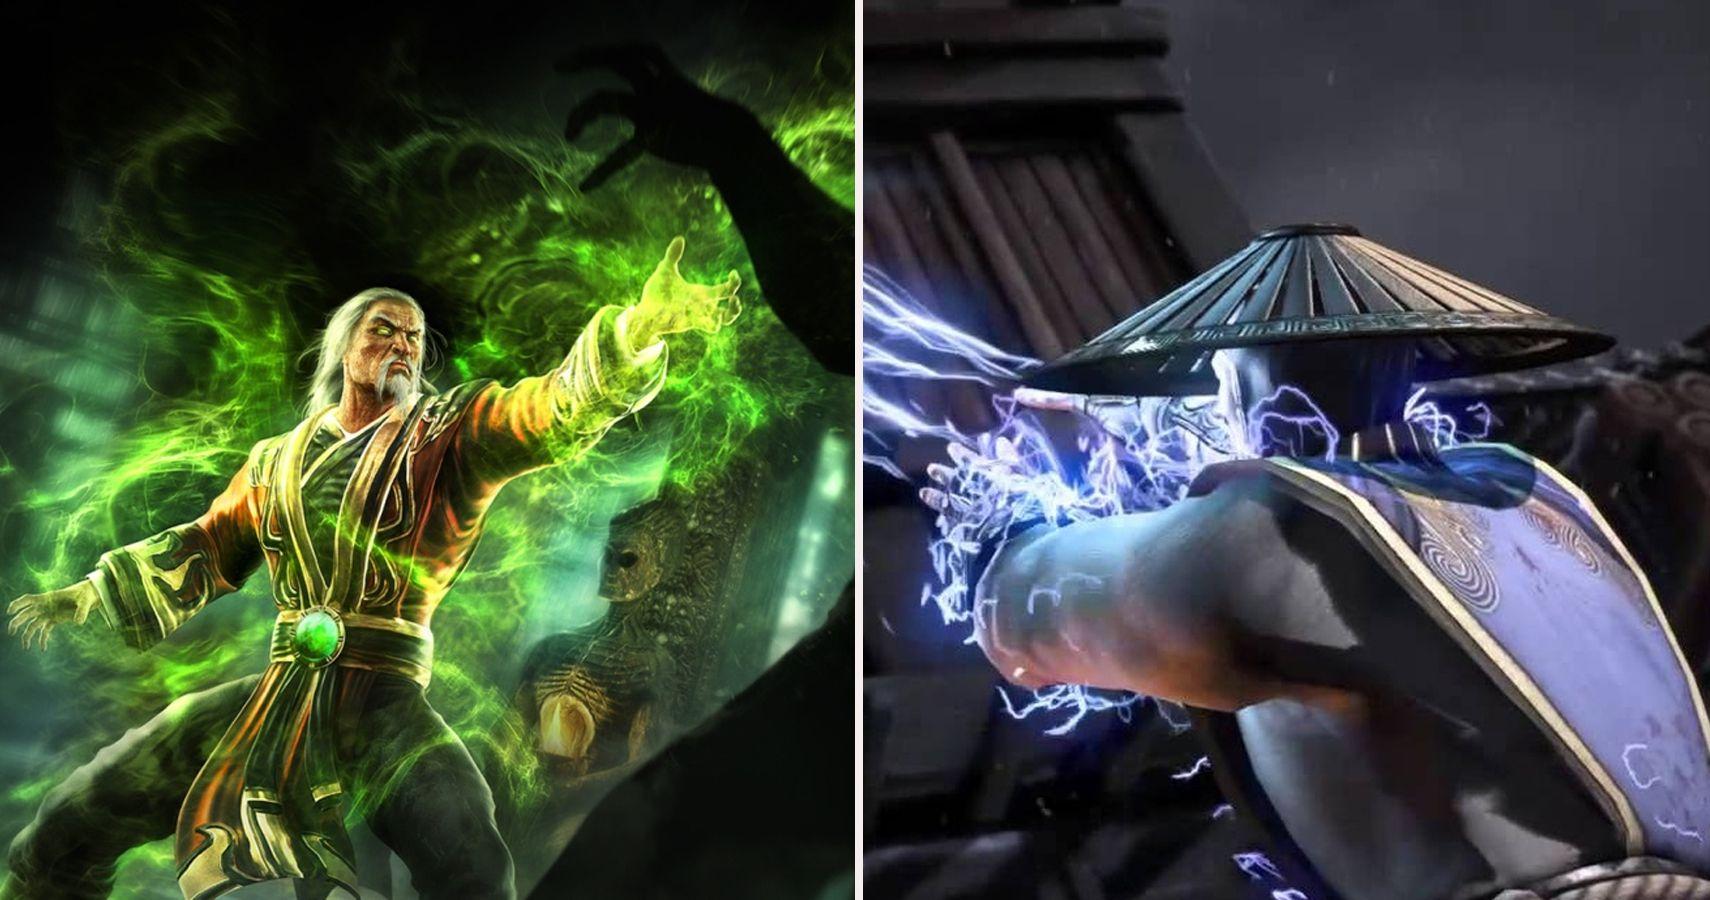 Mortal Kombat Babality: Mk9 Kratos Babality – Articleblog info